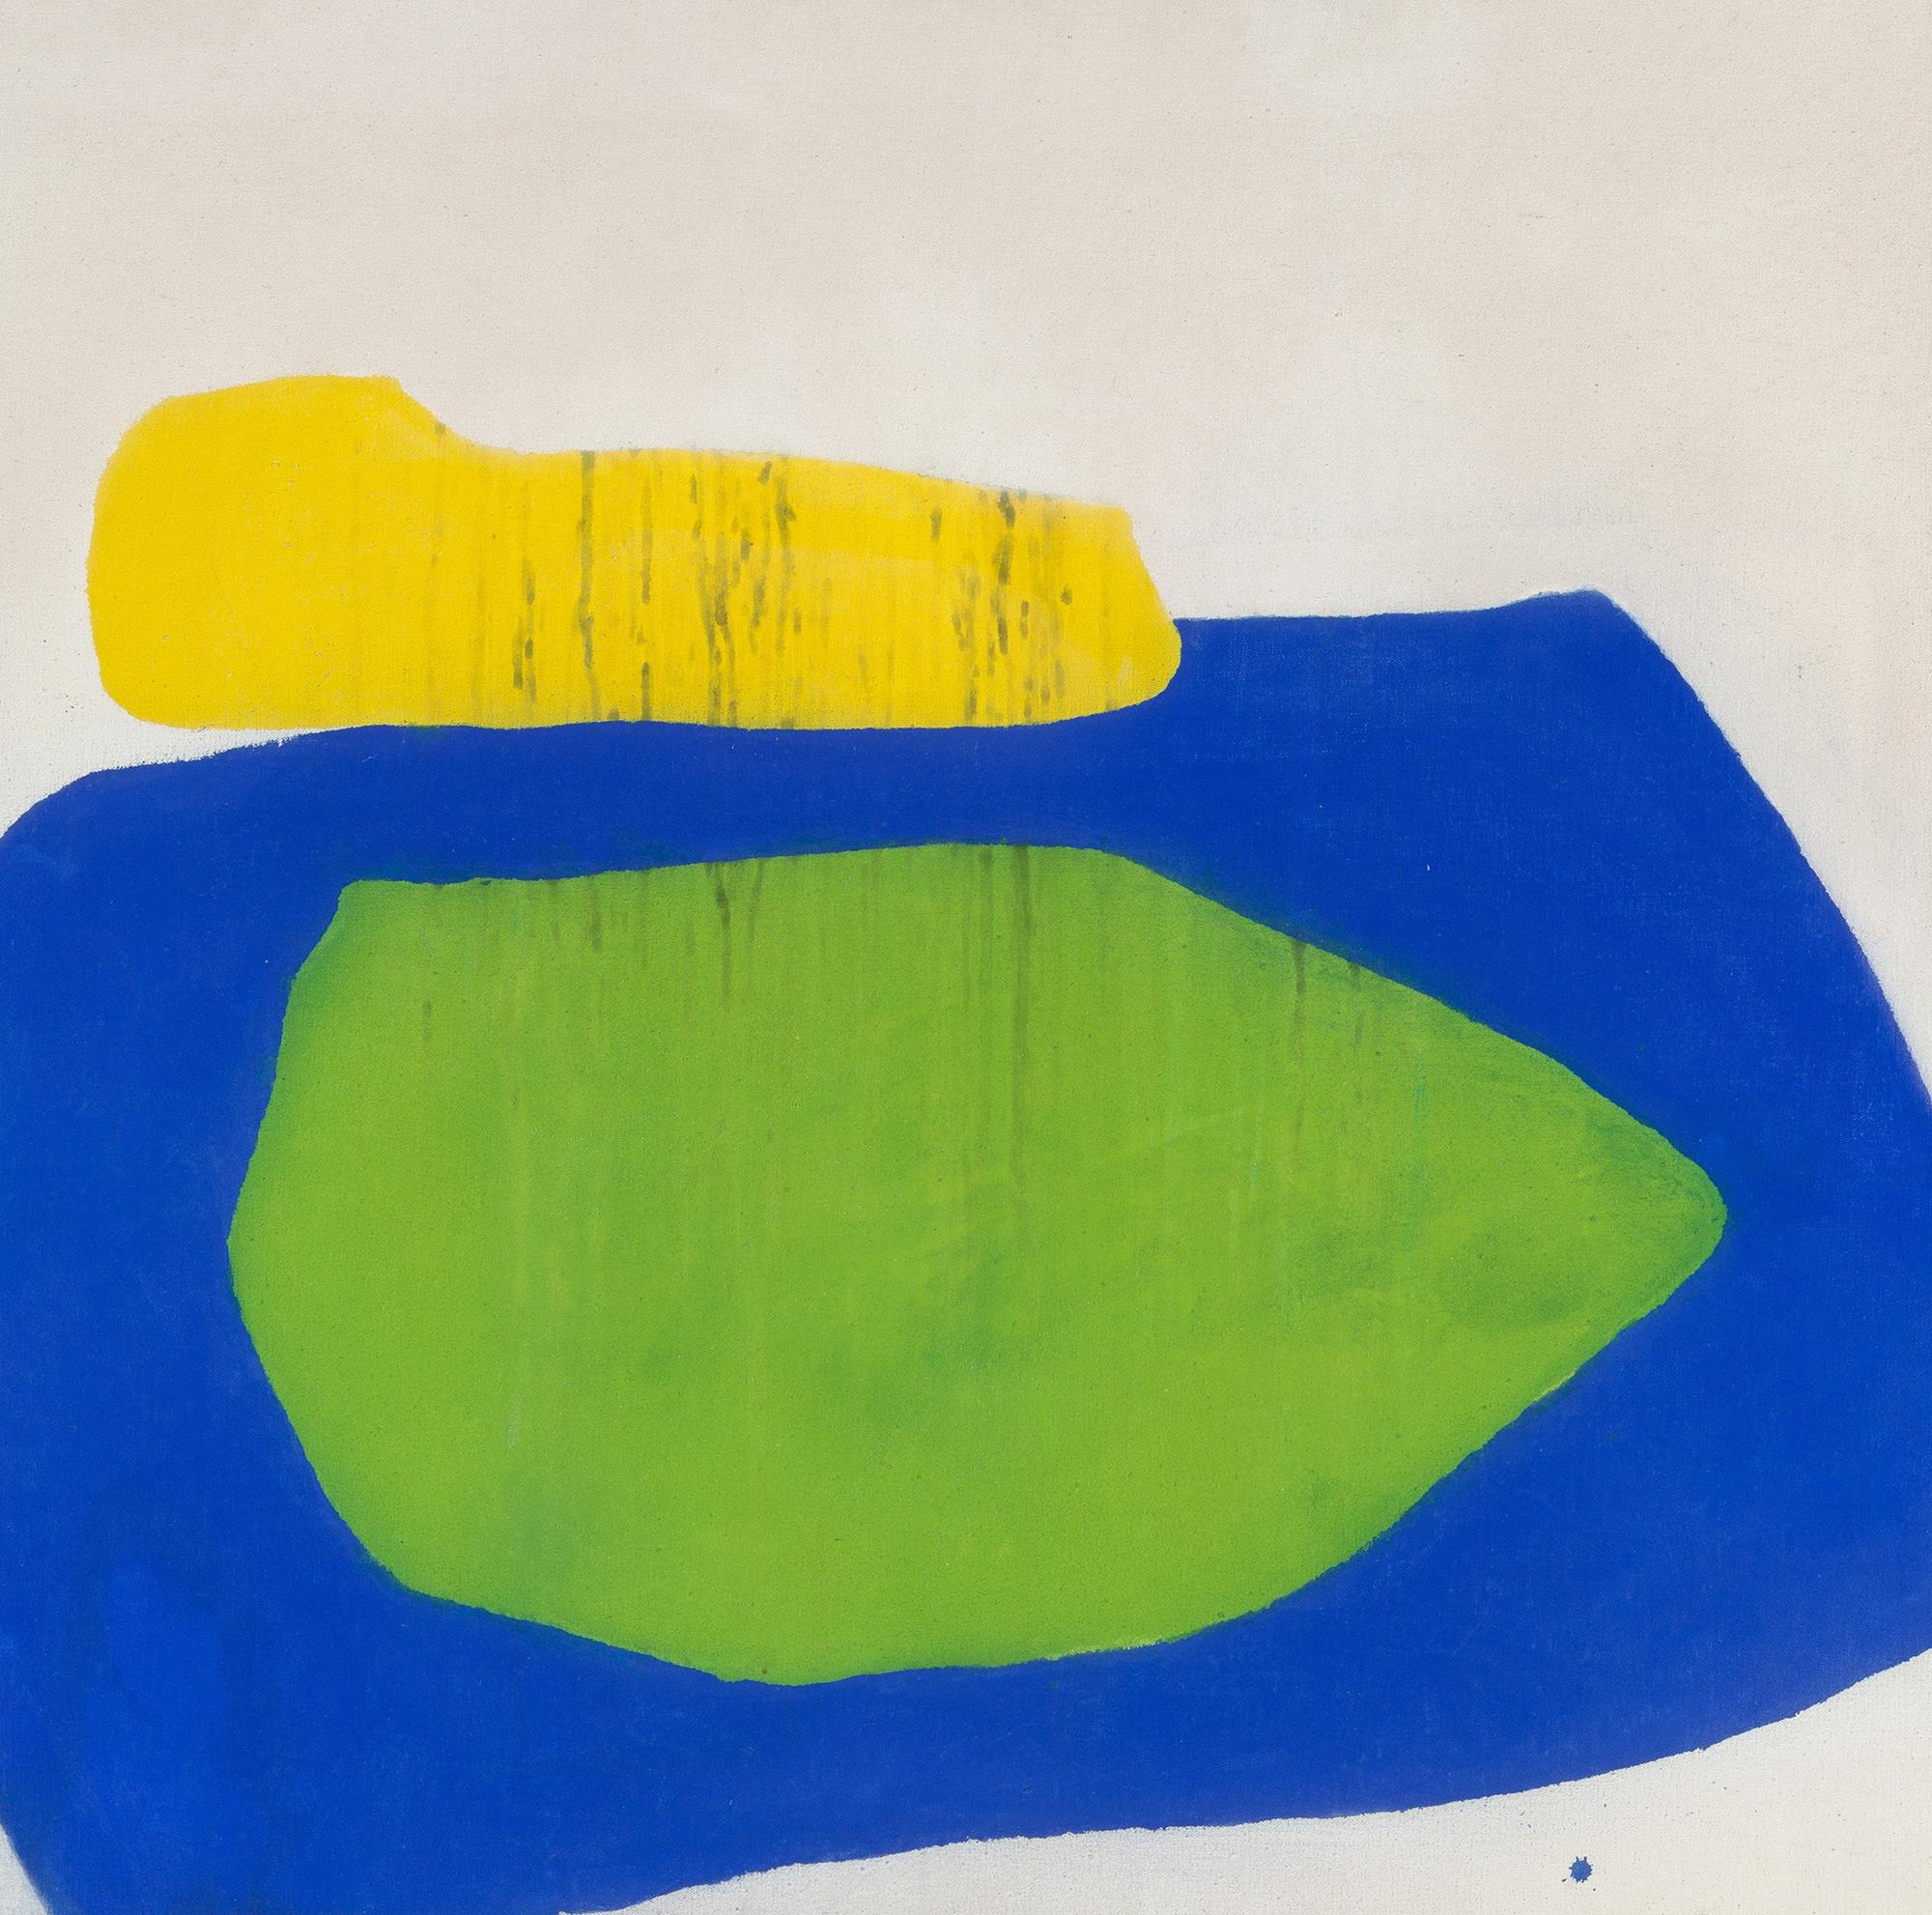 SOLD   Ozona, 1964, o il on canvas, 33 x 33 inches